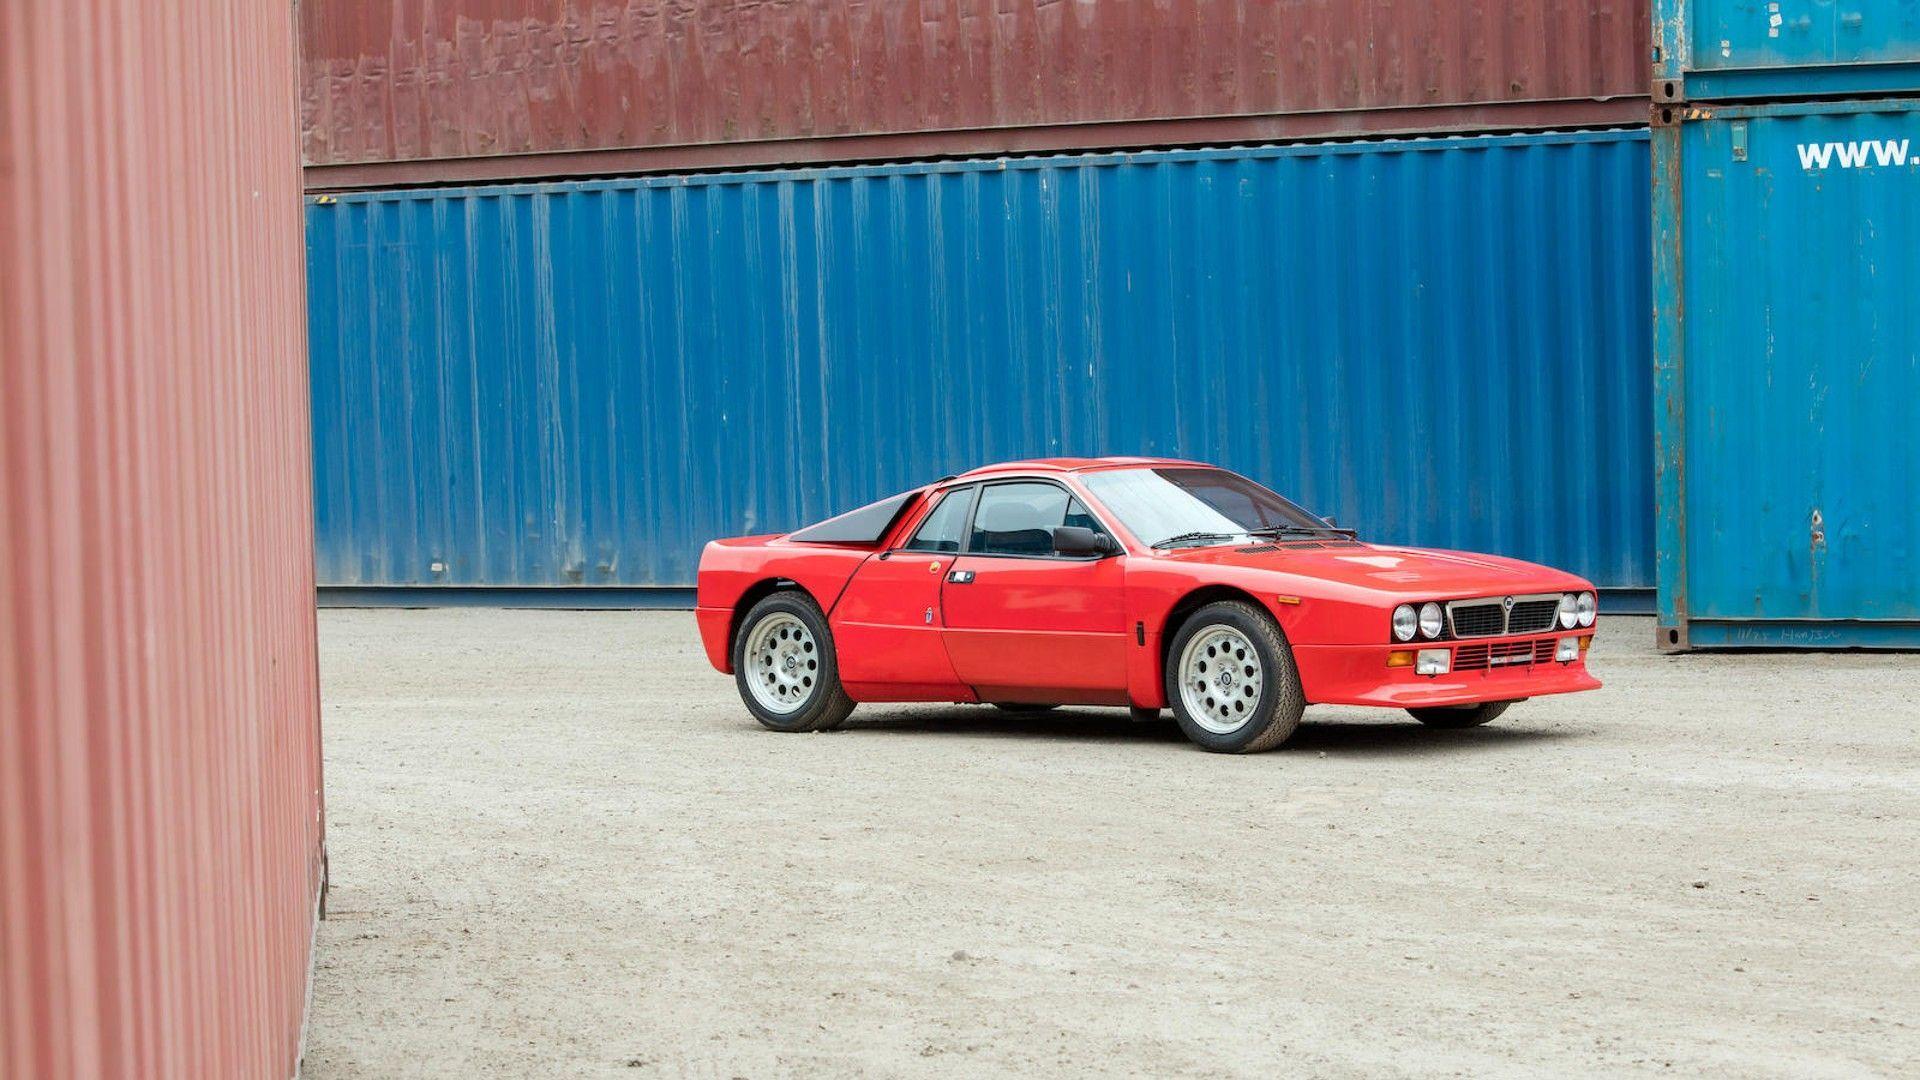 1983_Lancia-Abarth_037_Stradale_07